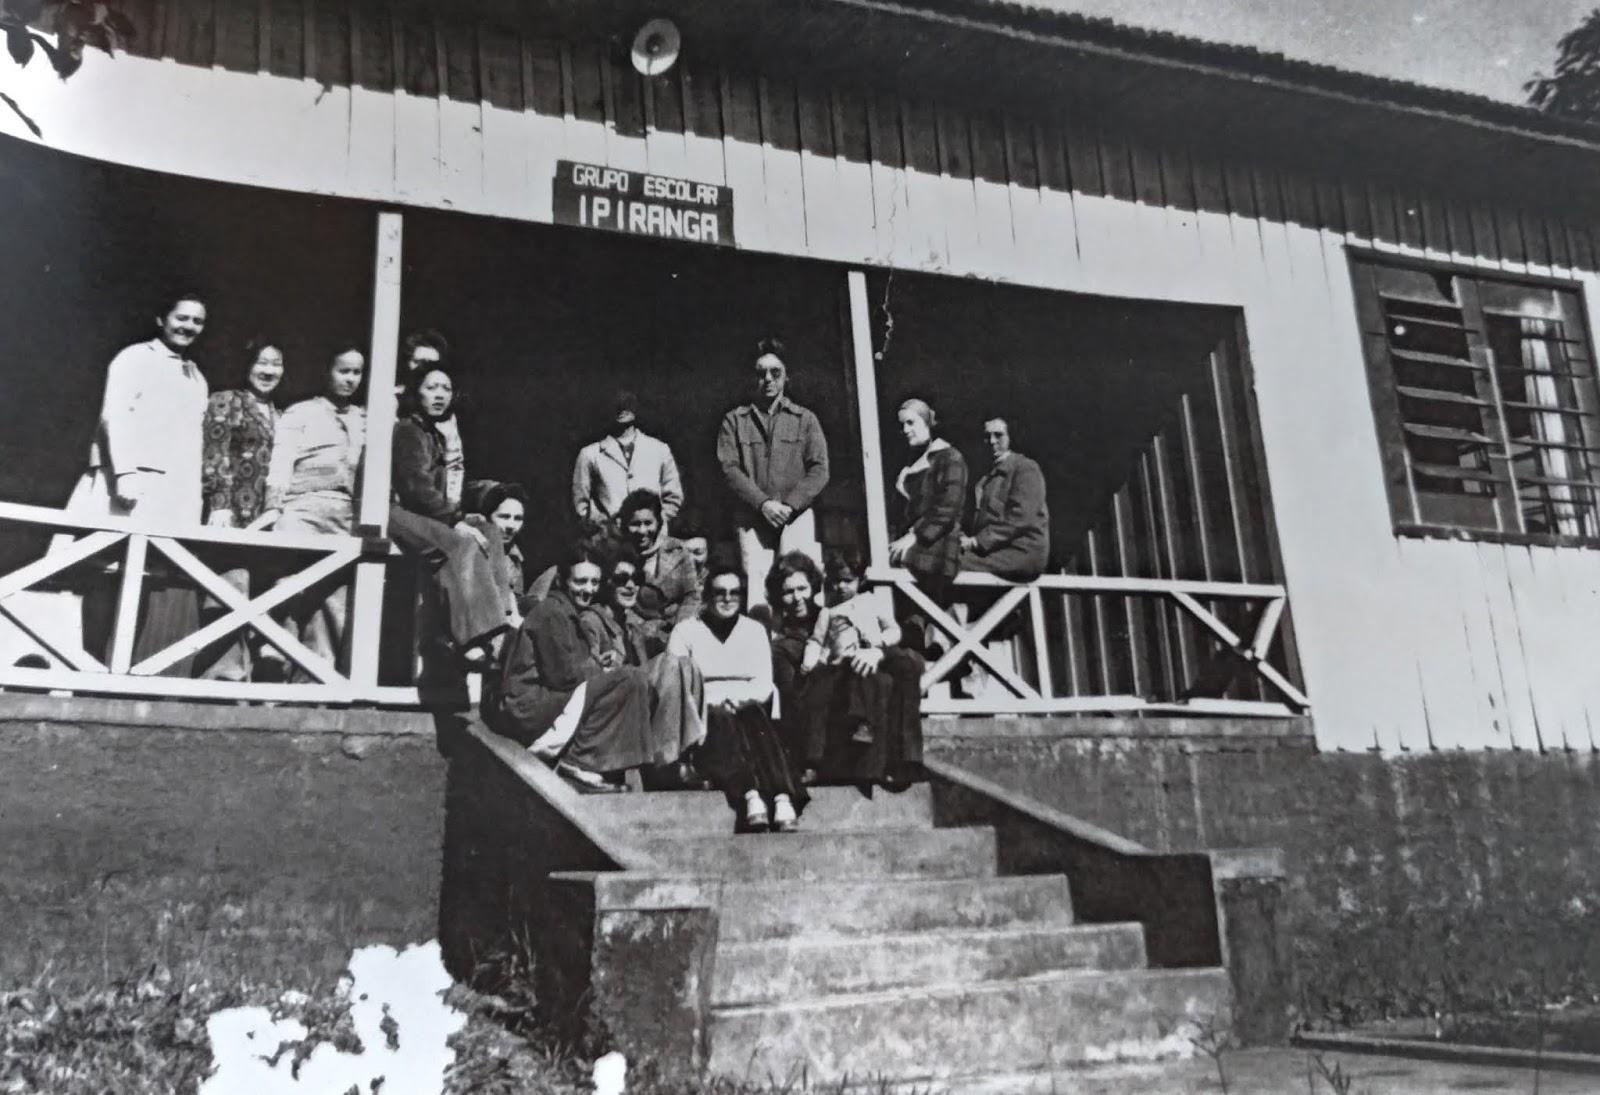 Grupo Escolar Ipiranga - Década de 1960